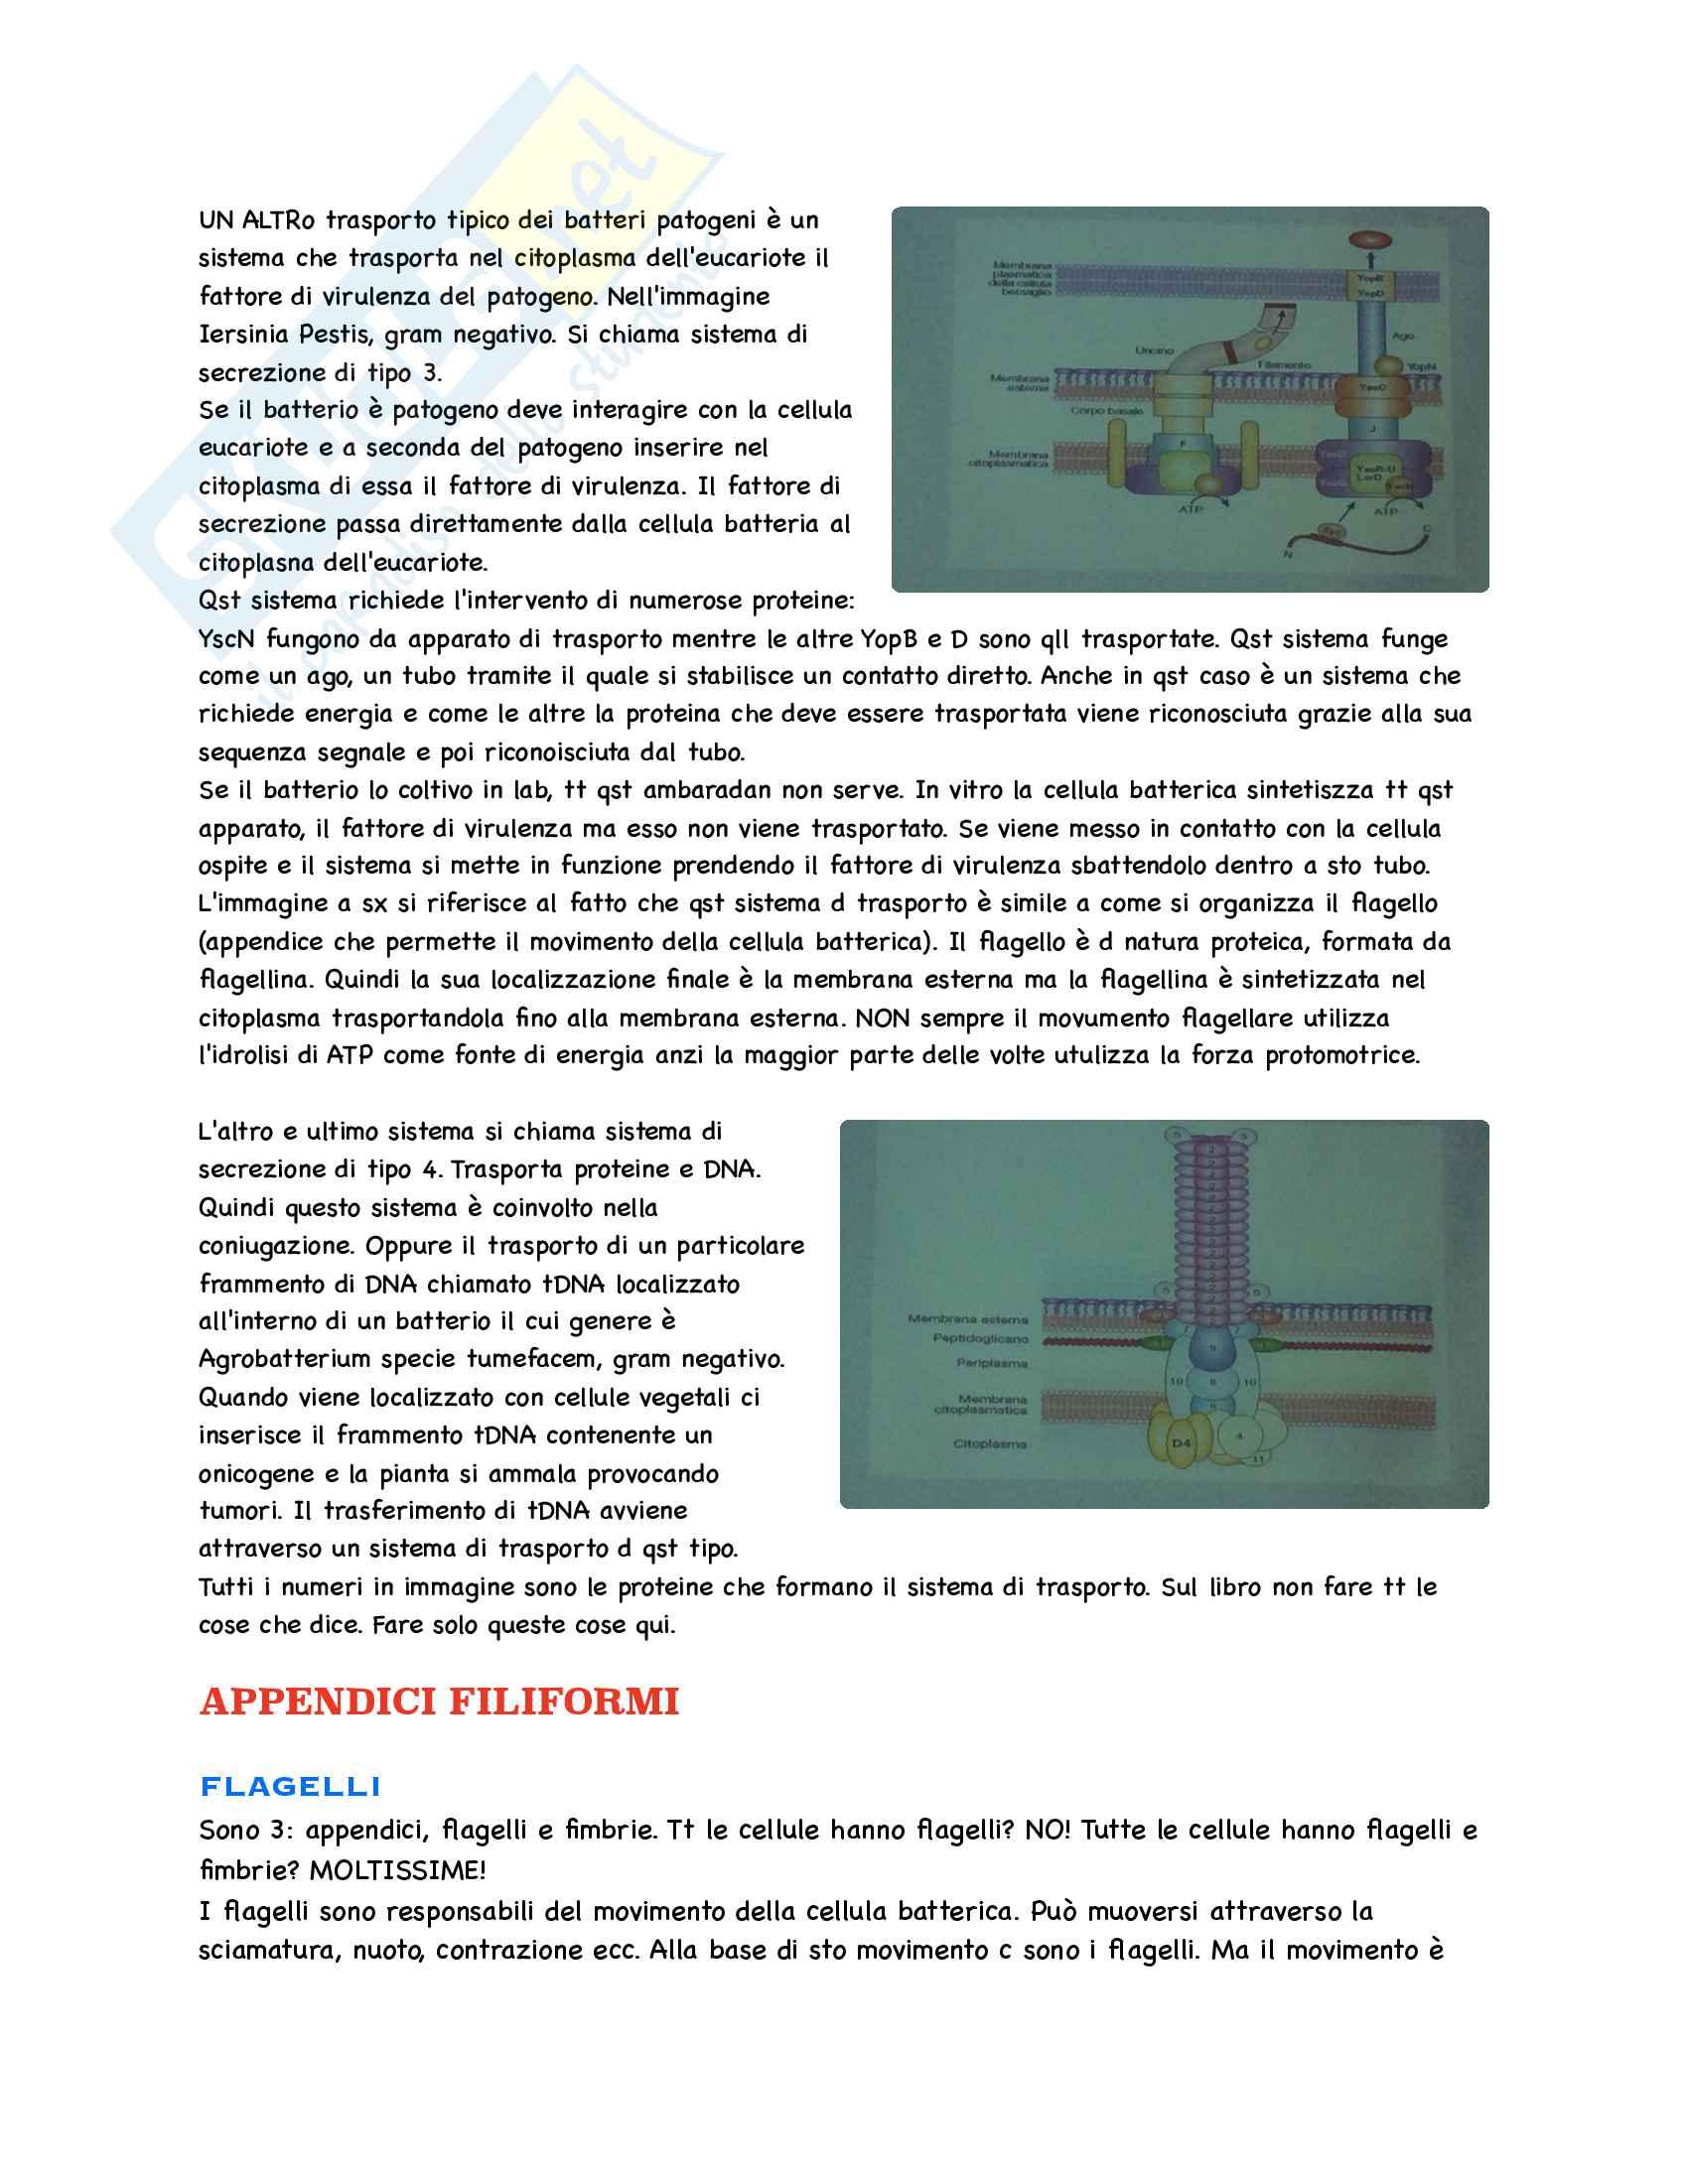 Microbiologia Appunti Parte 1 Pag. 16